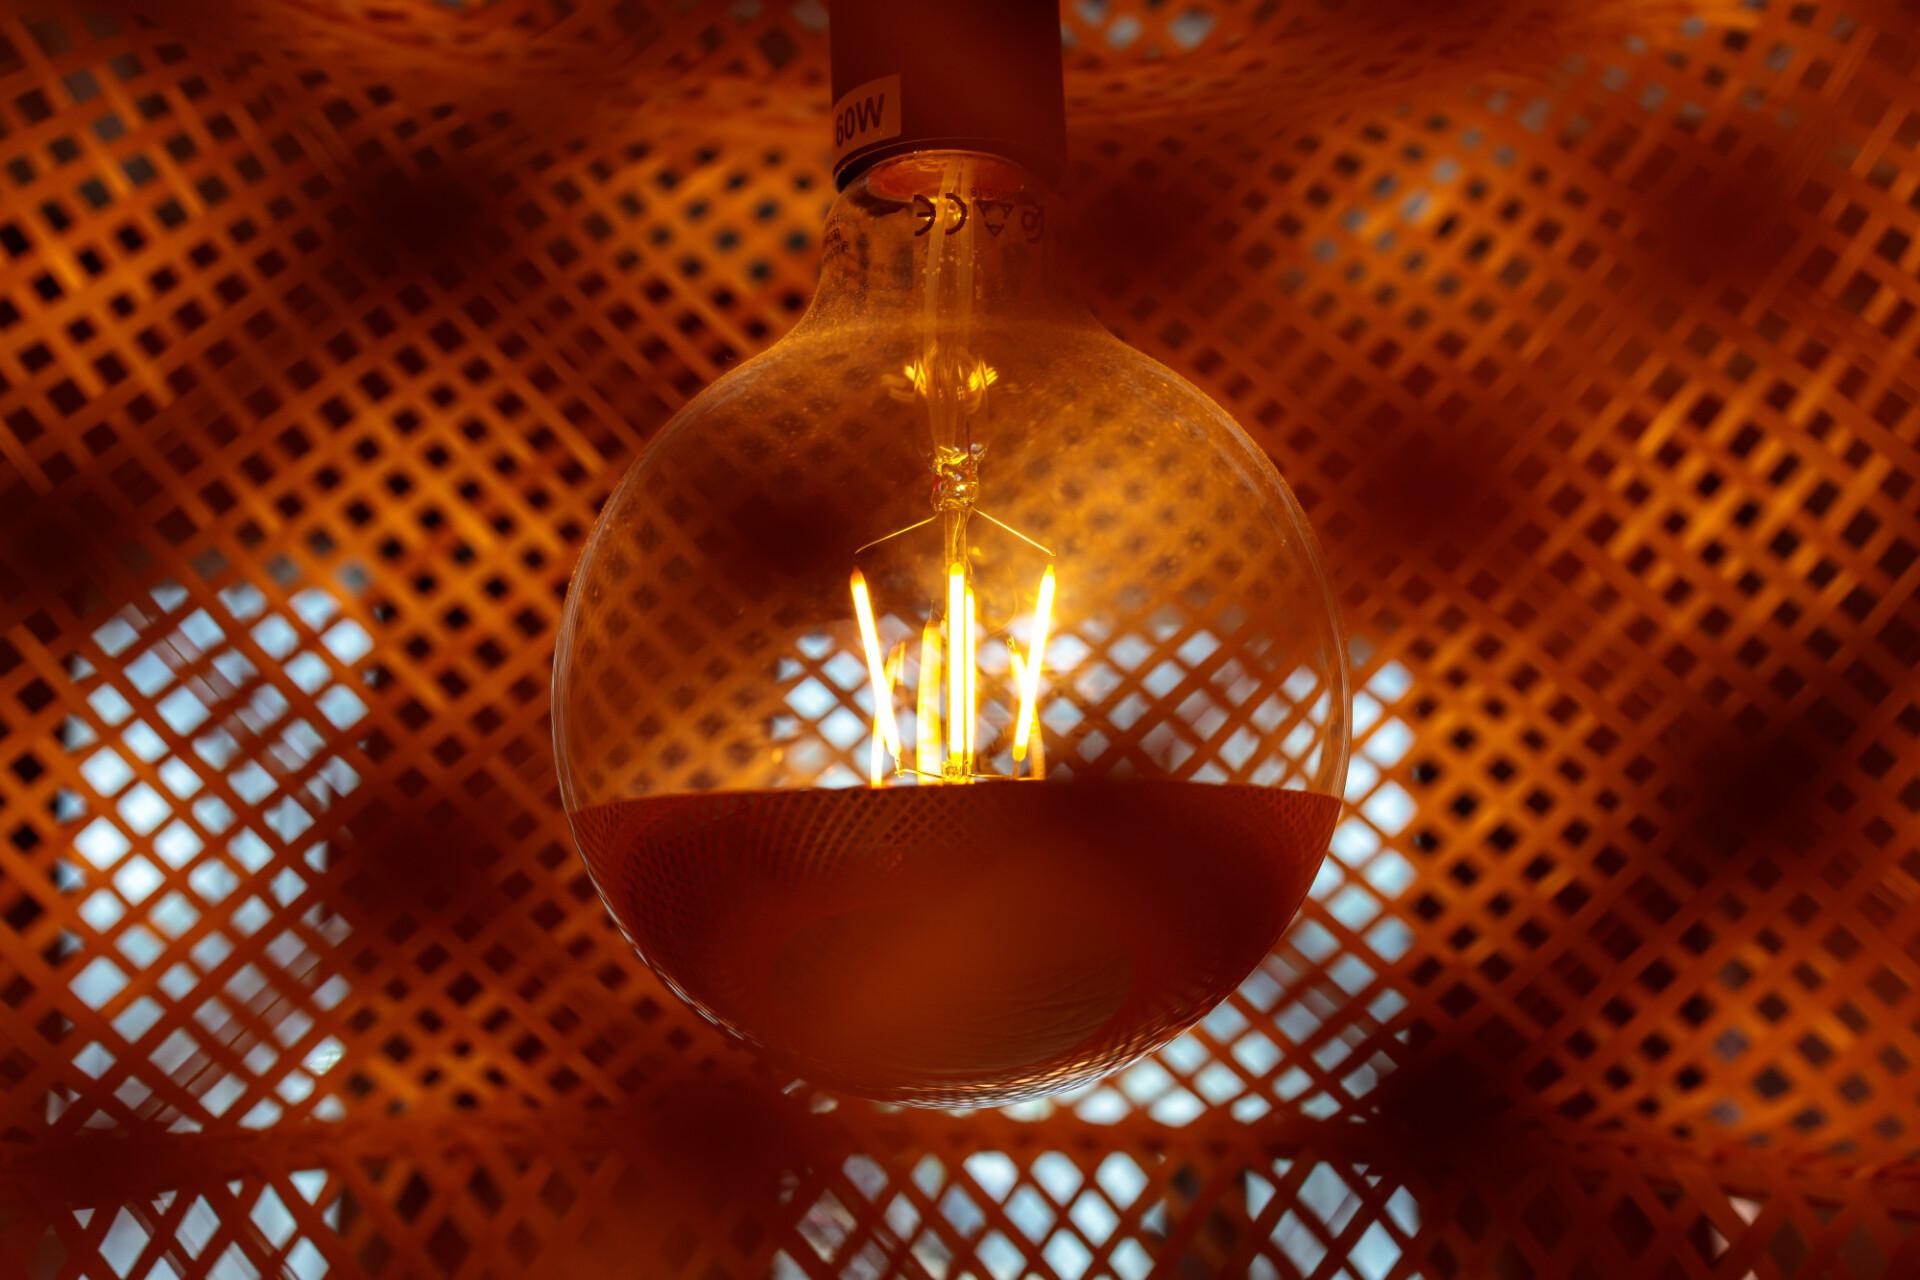 Light bulb in a lamp